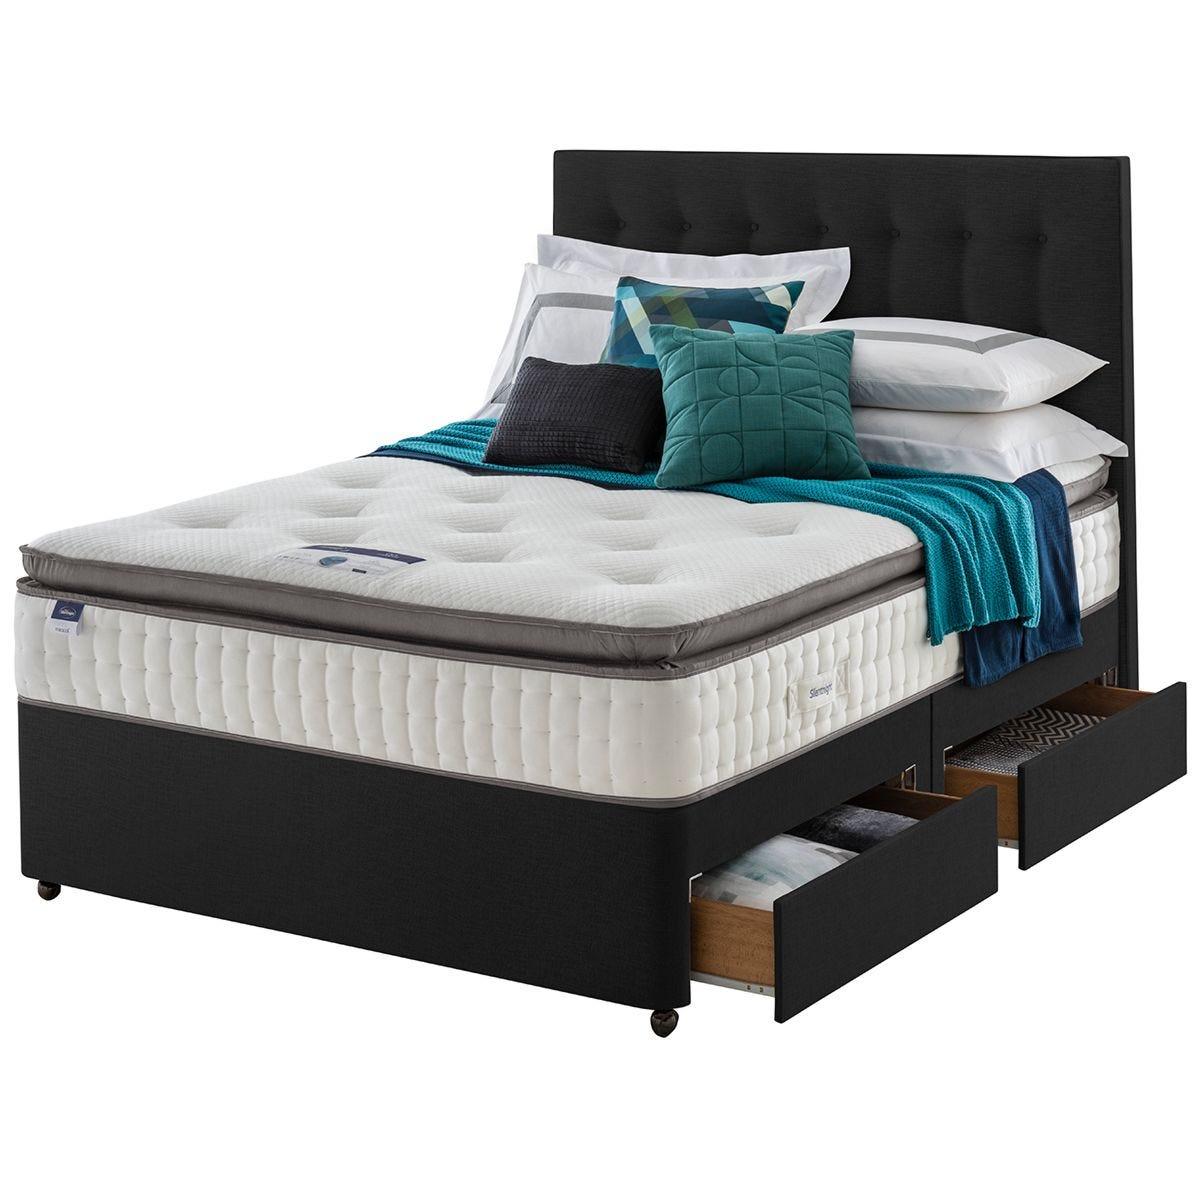 Silentnight Miracoil Geltex 4 Drawer Divan Bed - Ebony